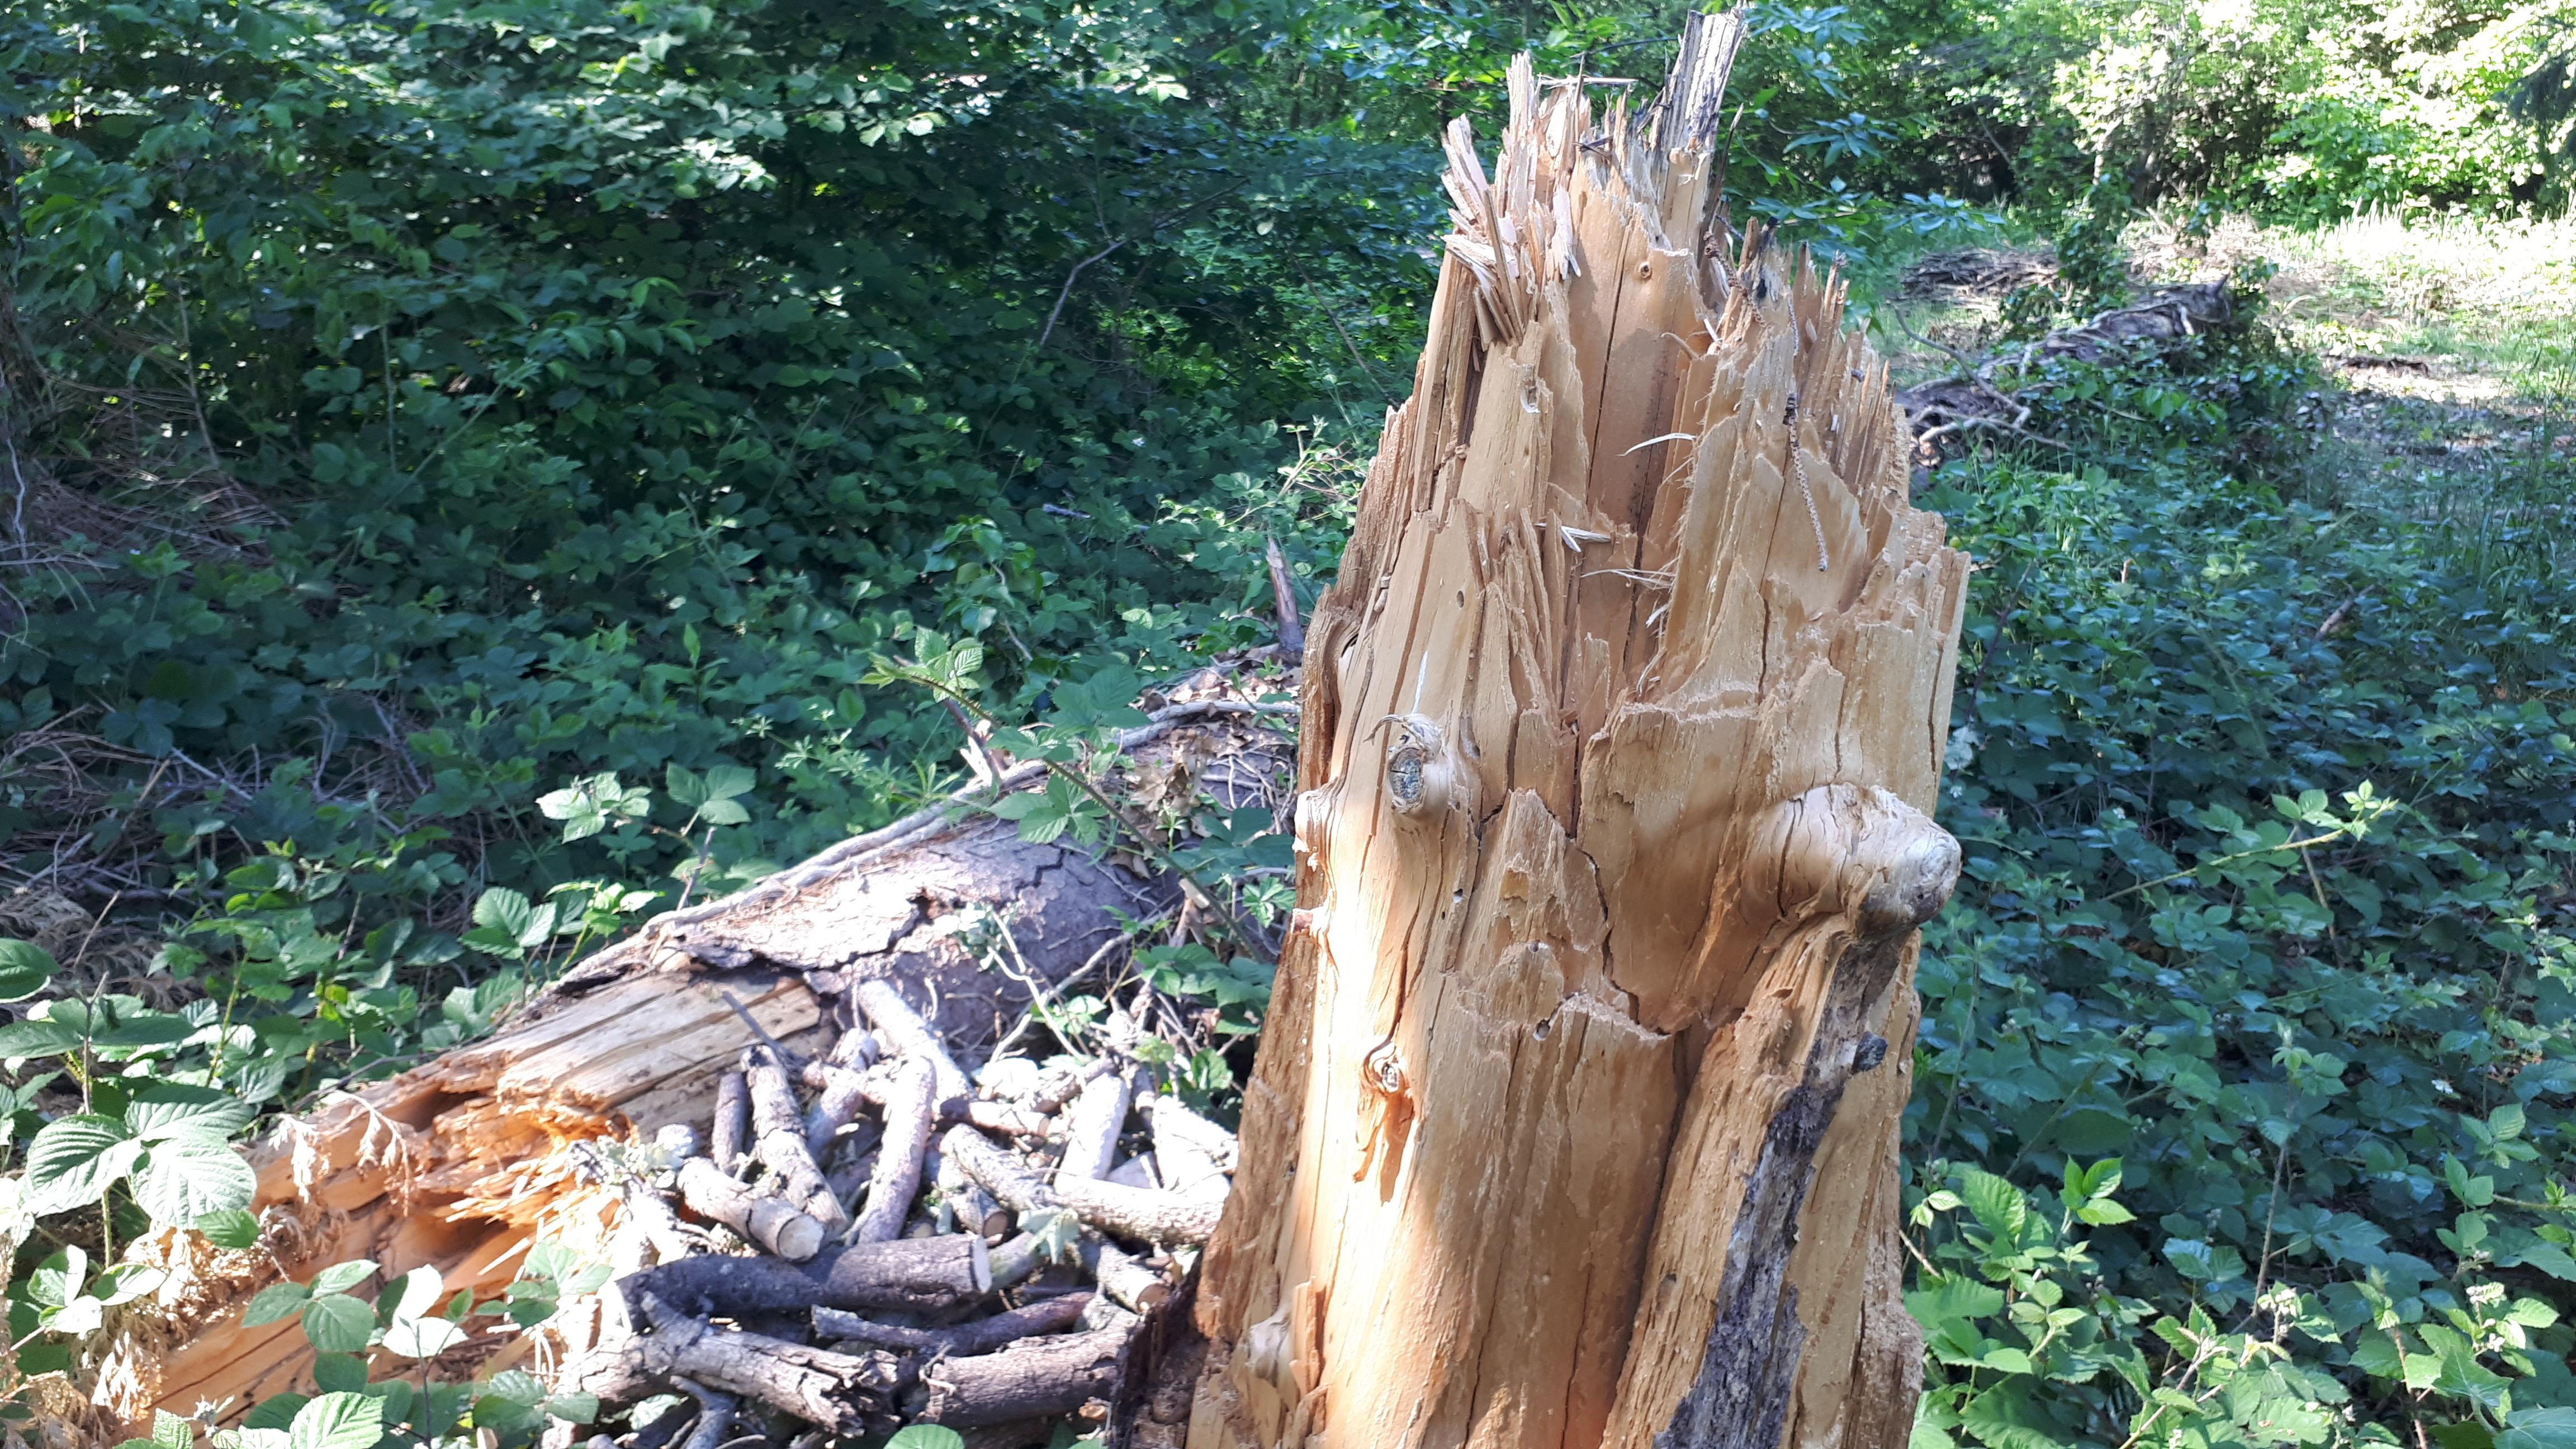 Wat een kracht die wind,... leek nog een stevige boom